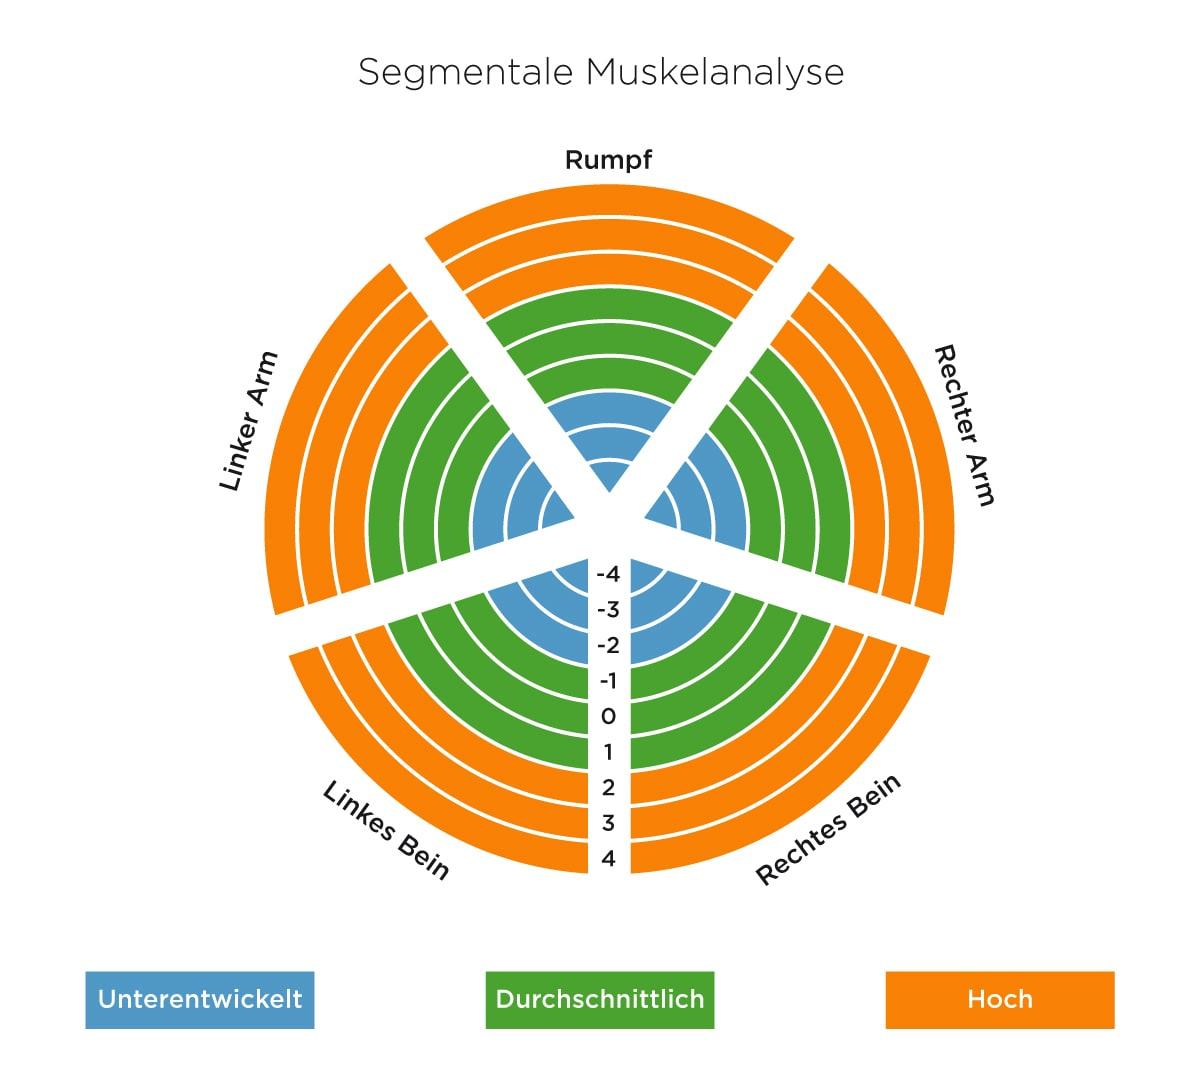 Segmentale Muskelanalyse